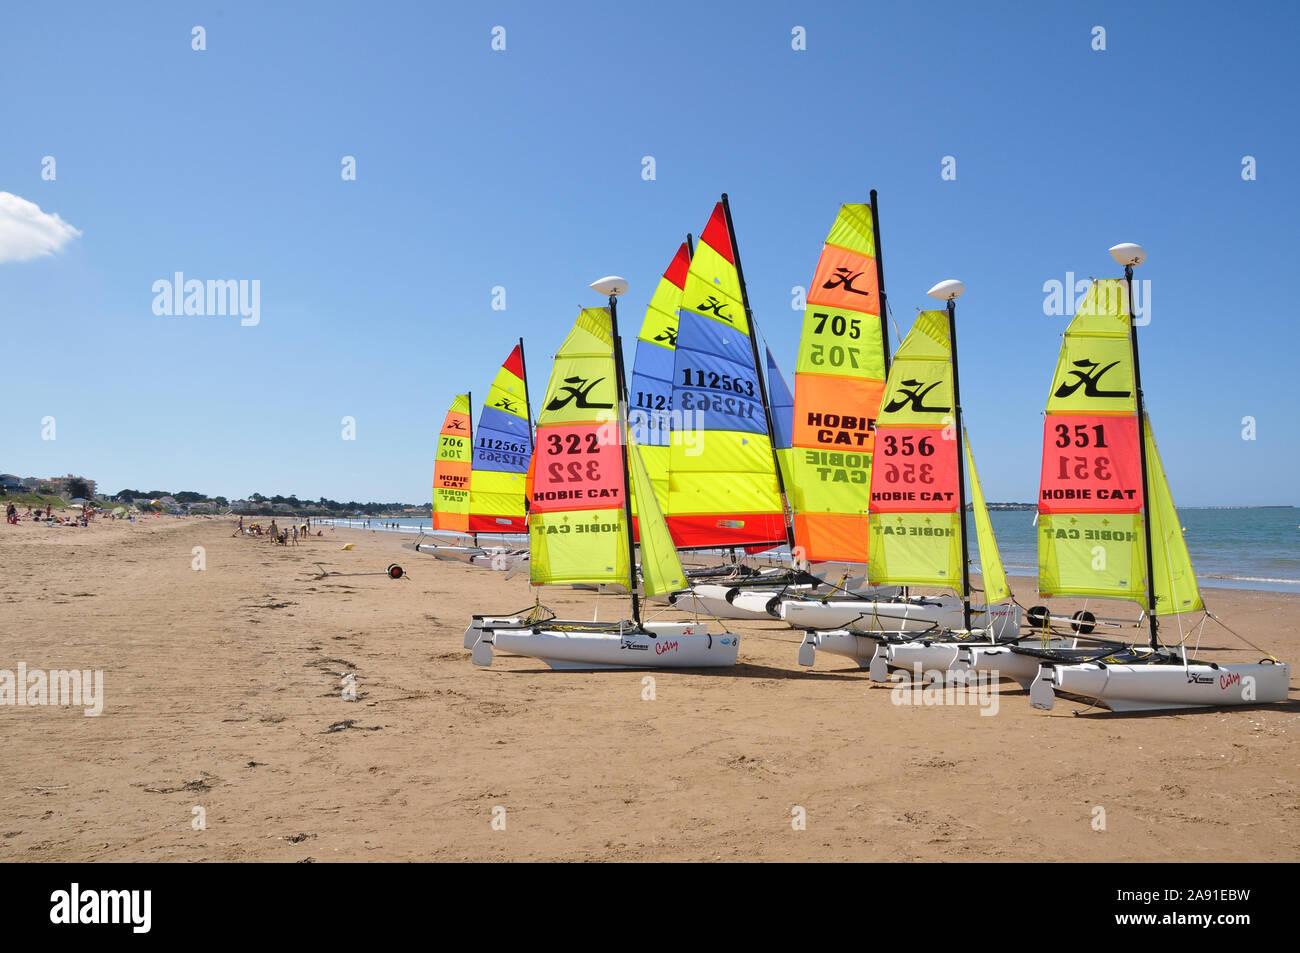 Catamarans on Tharon beach, Loire Atlantique, Stock Photo